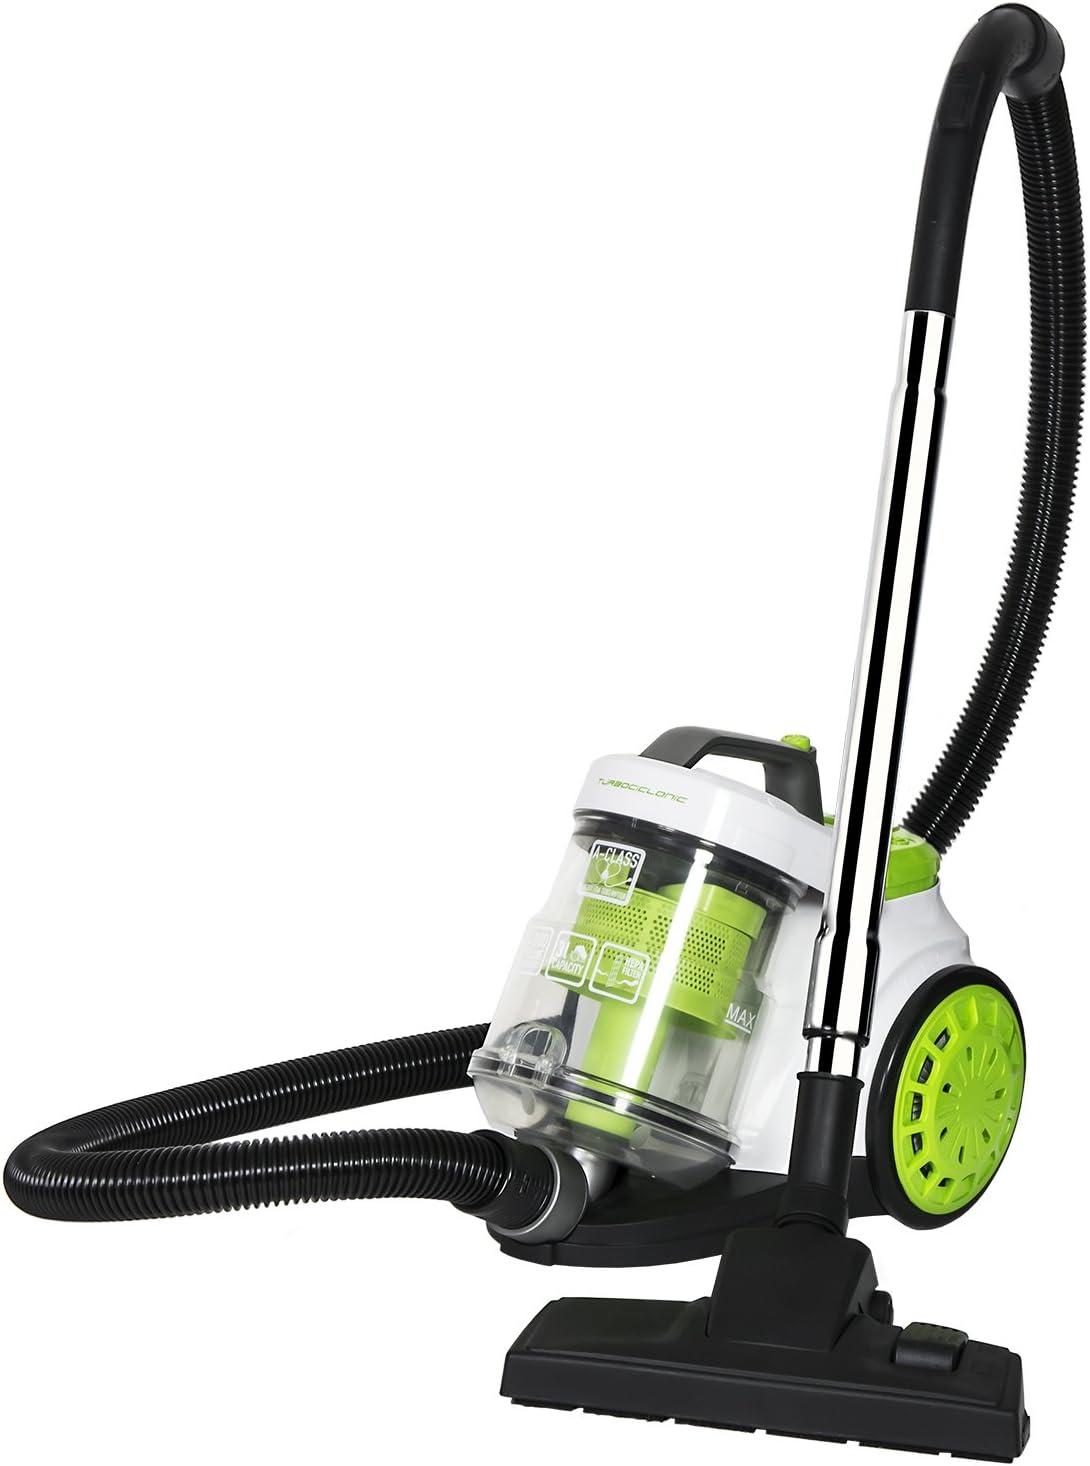 Cecotec Conga Aspirador Turbociclónico 800W: Amazon.es: Hogar